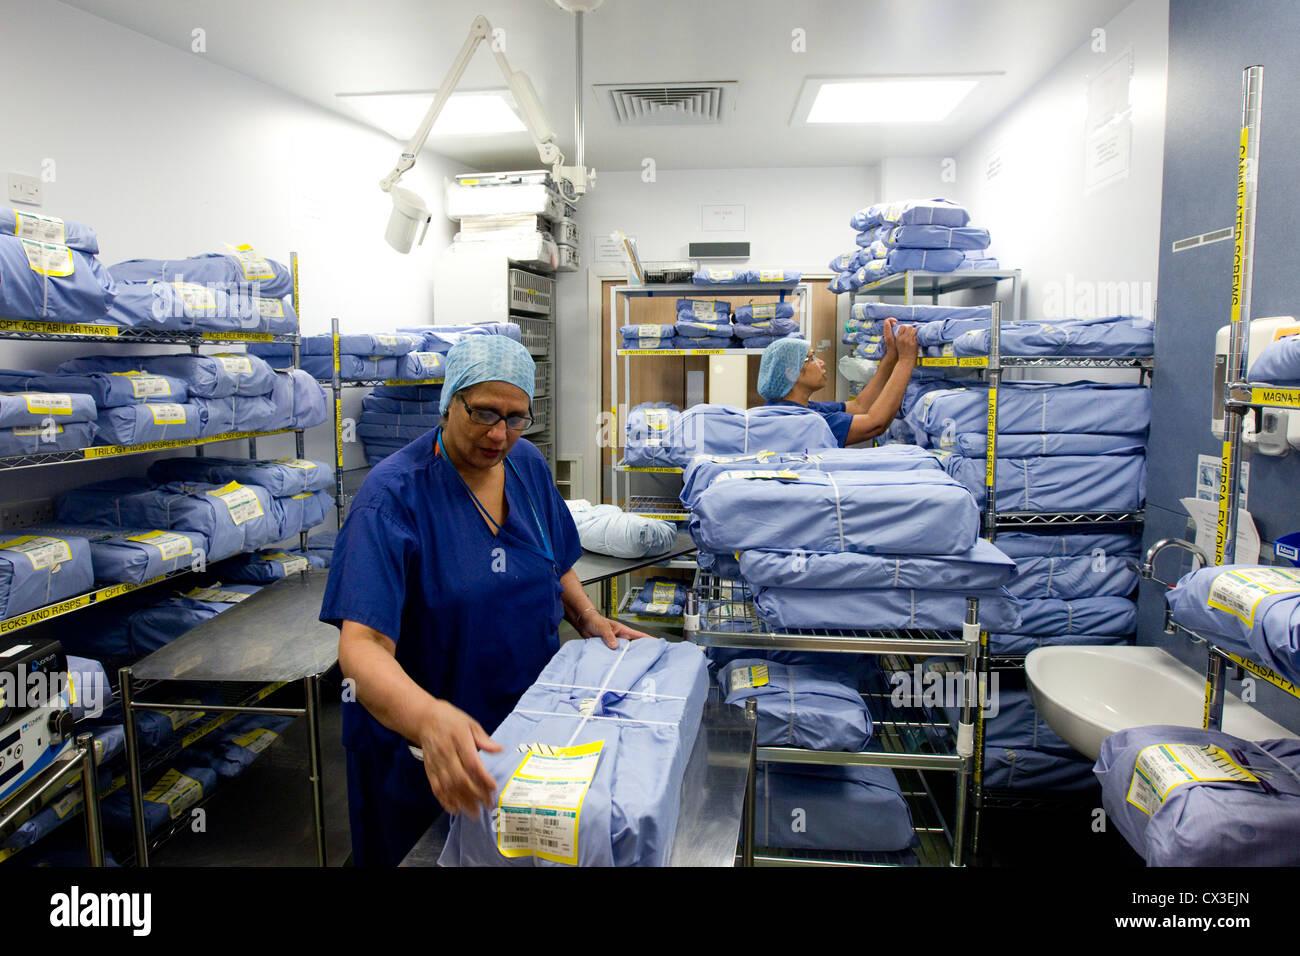 Hospital Linen room - Stock Image